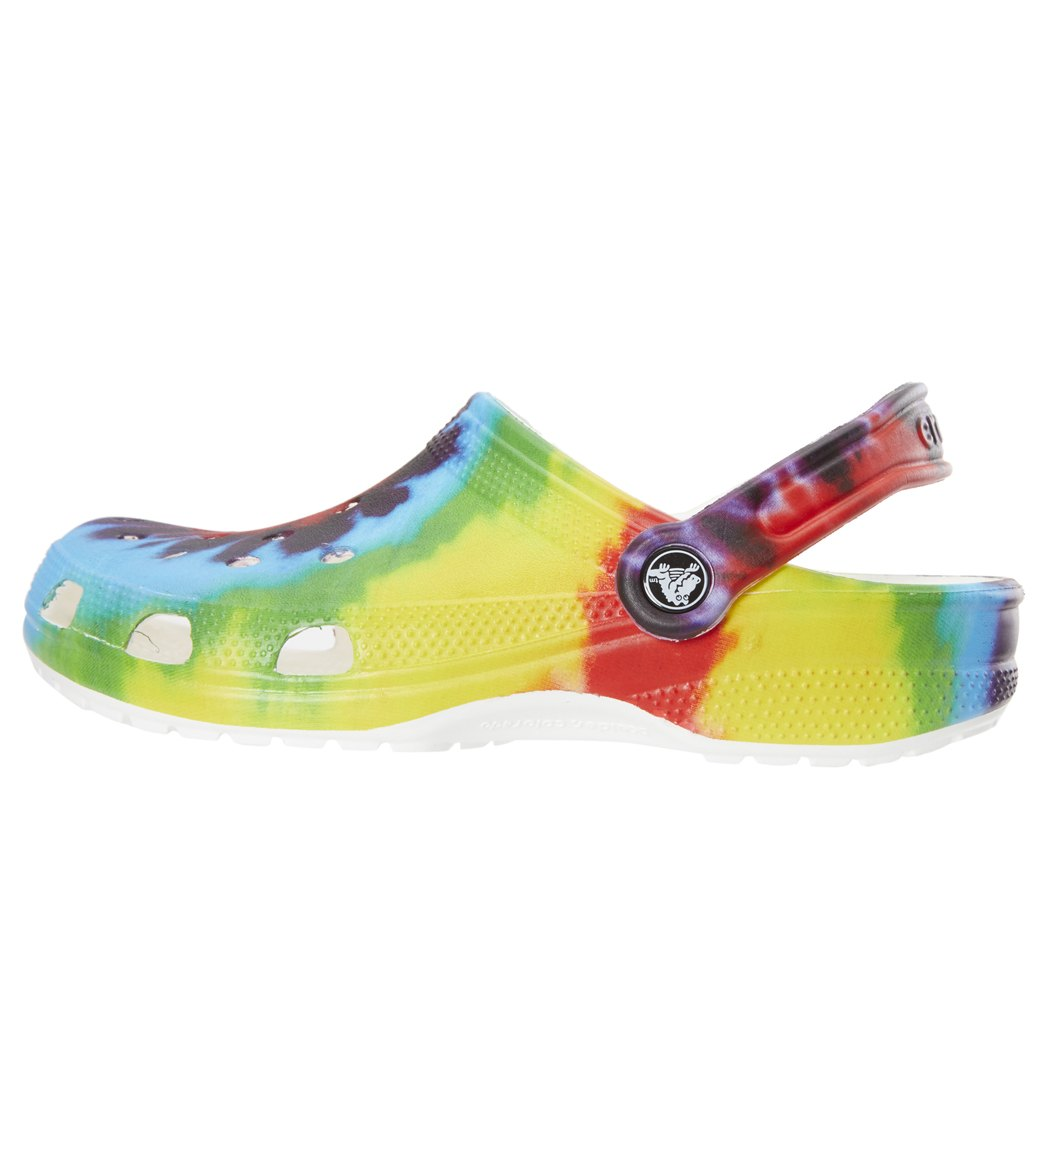 a4e19a2a1dbe Crocs Classic Tie Dye Graphic Clog at SwimOutlet.com